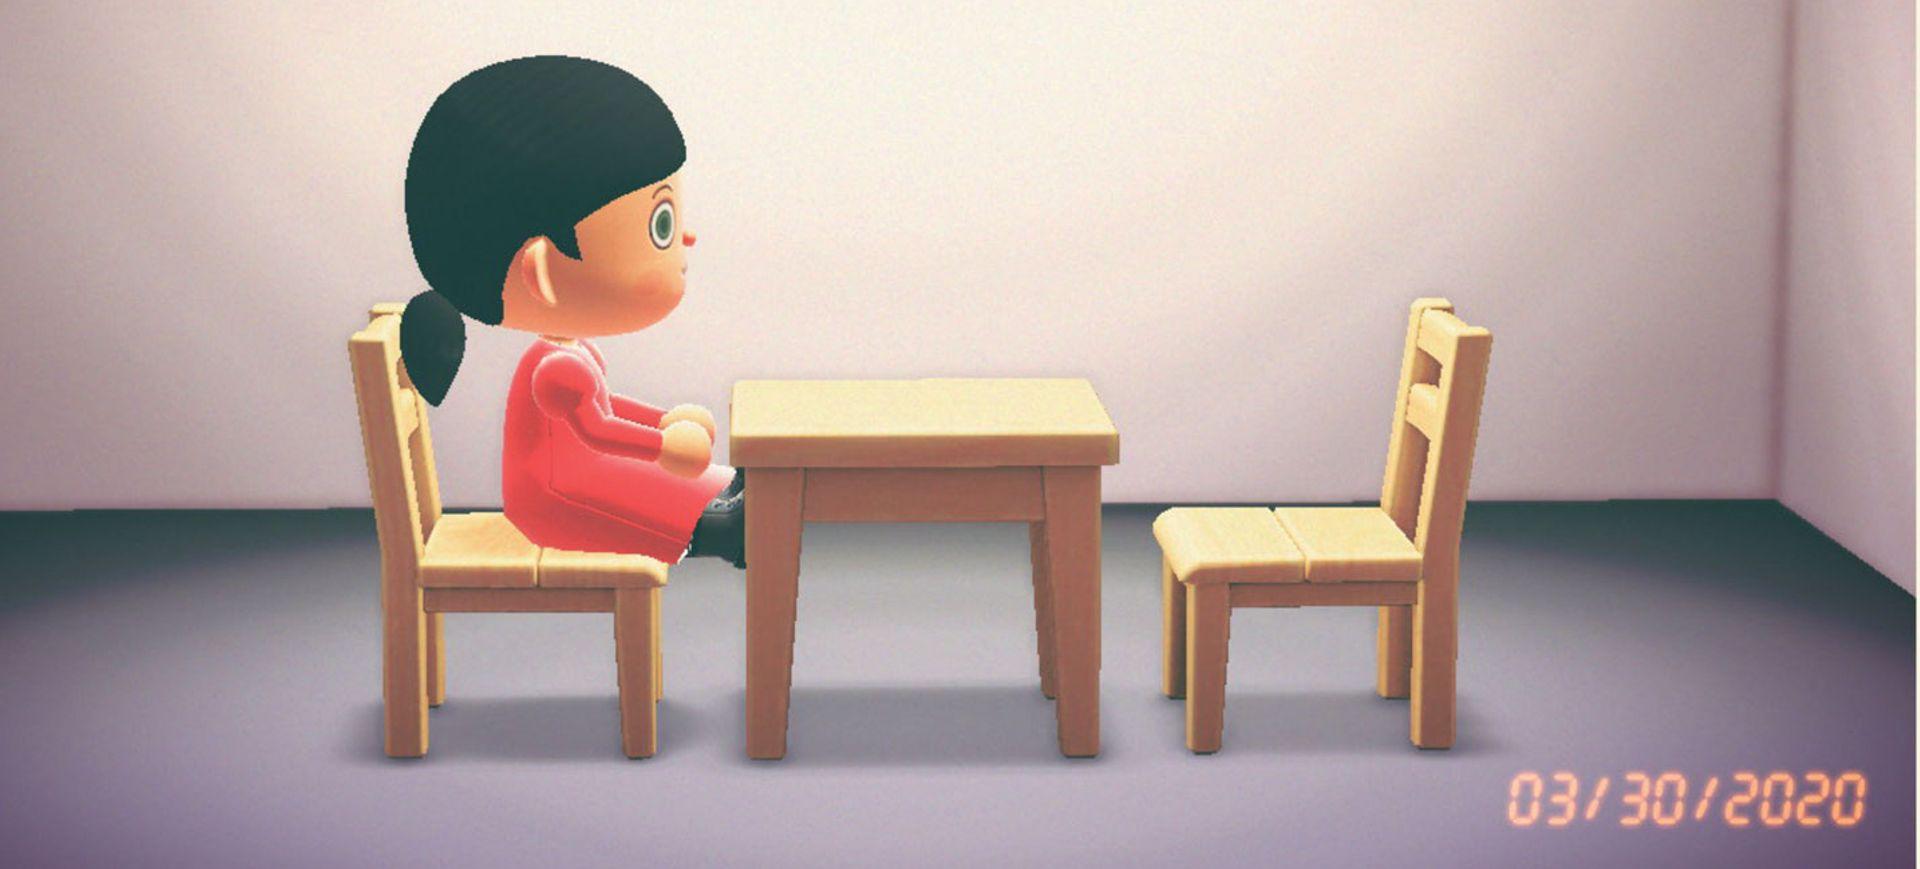 A still from Animal Crossing by Shing Yin Khor A still from Animal Crossing by Shing Yin Khor